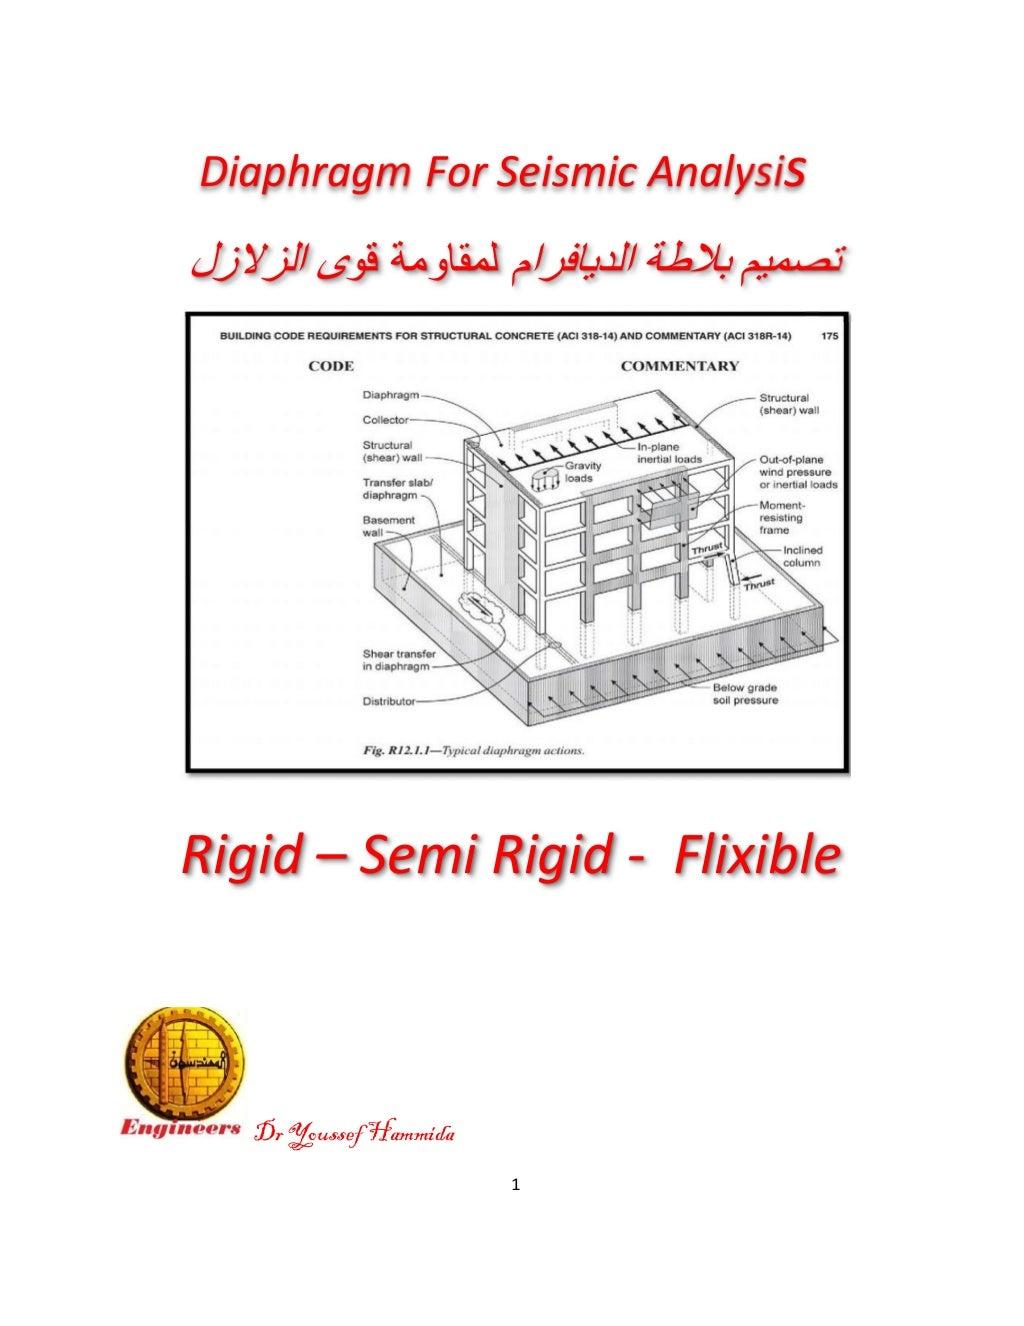 rigid-semi-rigid-flexible-diaphragm-for-seismic-analysis-1-1024.jpg